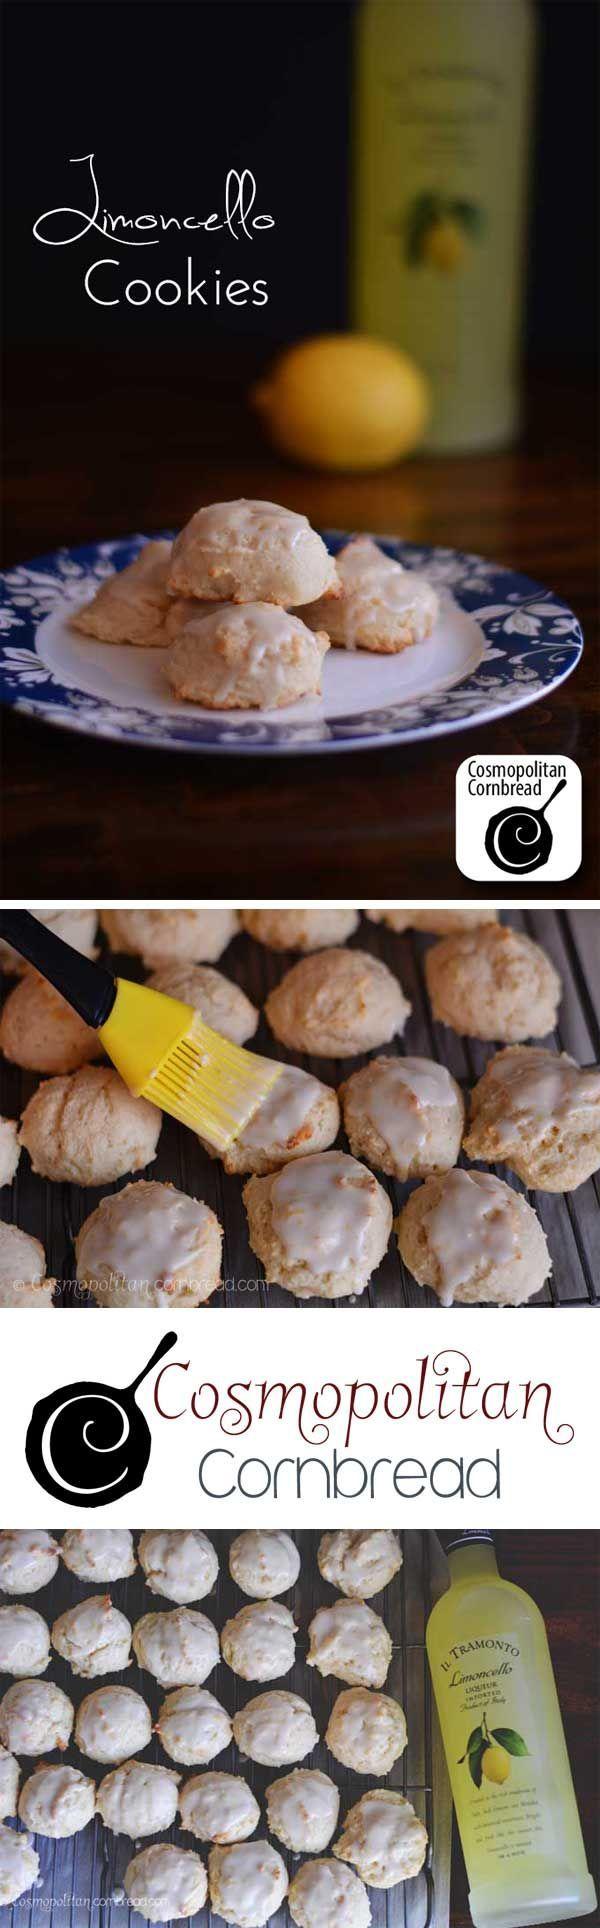 Italian inspired Limoncello Cookies from Cosmopolitan Cornbread #SundaySupper: